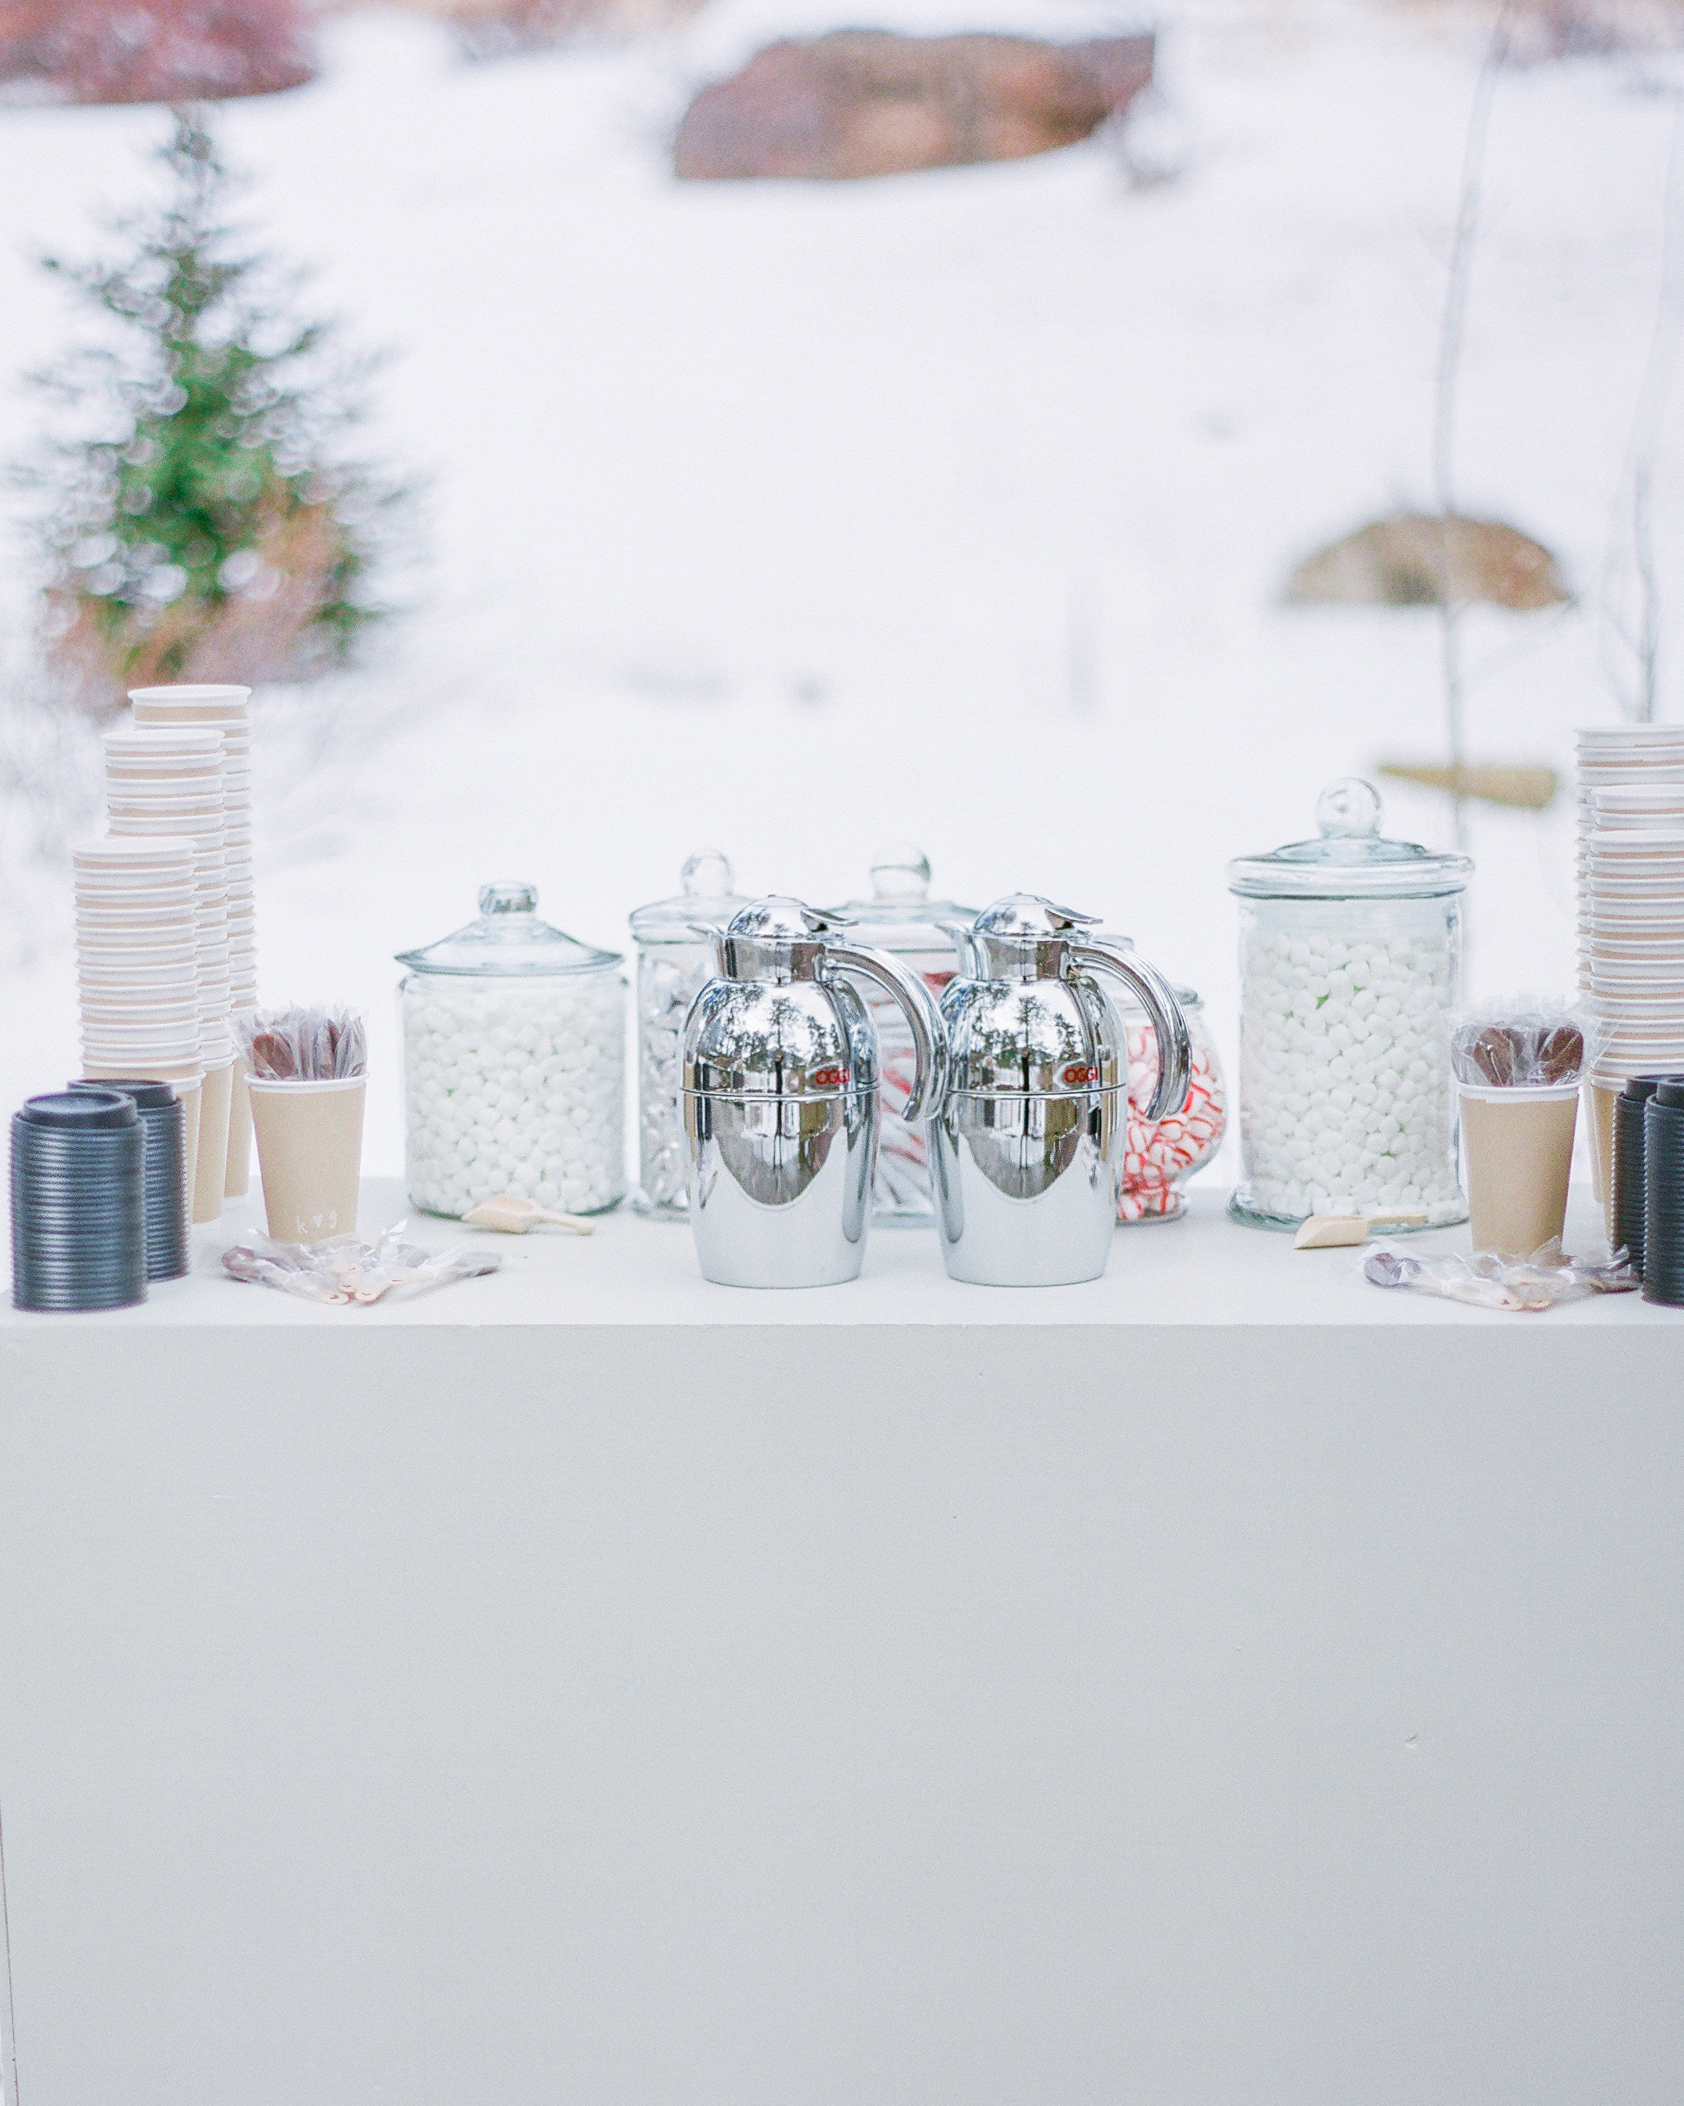 kendall-grant-wedding-candy-044-s112328-1215.jpg